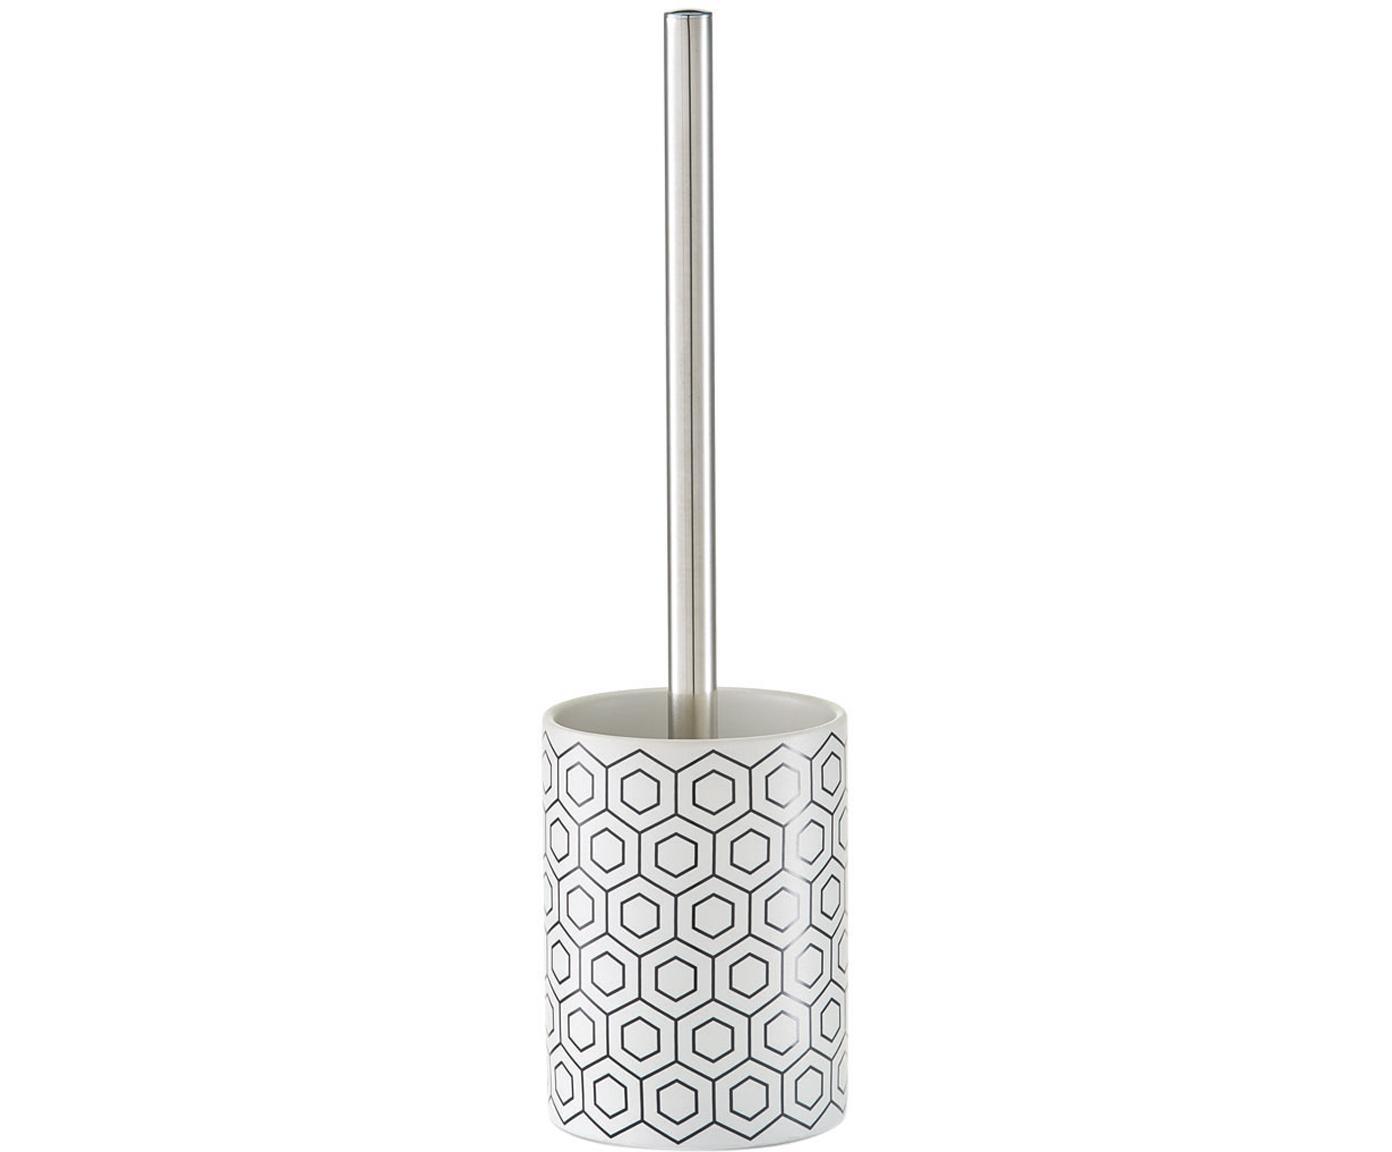 Toiletborstel Graphic met keramische houder, Houder: keramiek, Zwart, wit, Ø 10 x H 35 cm